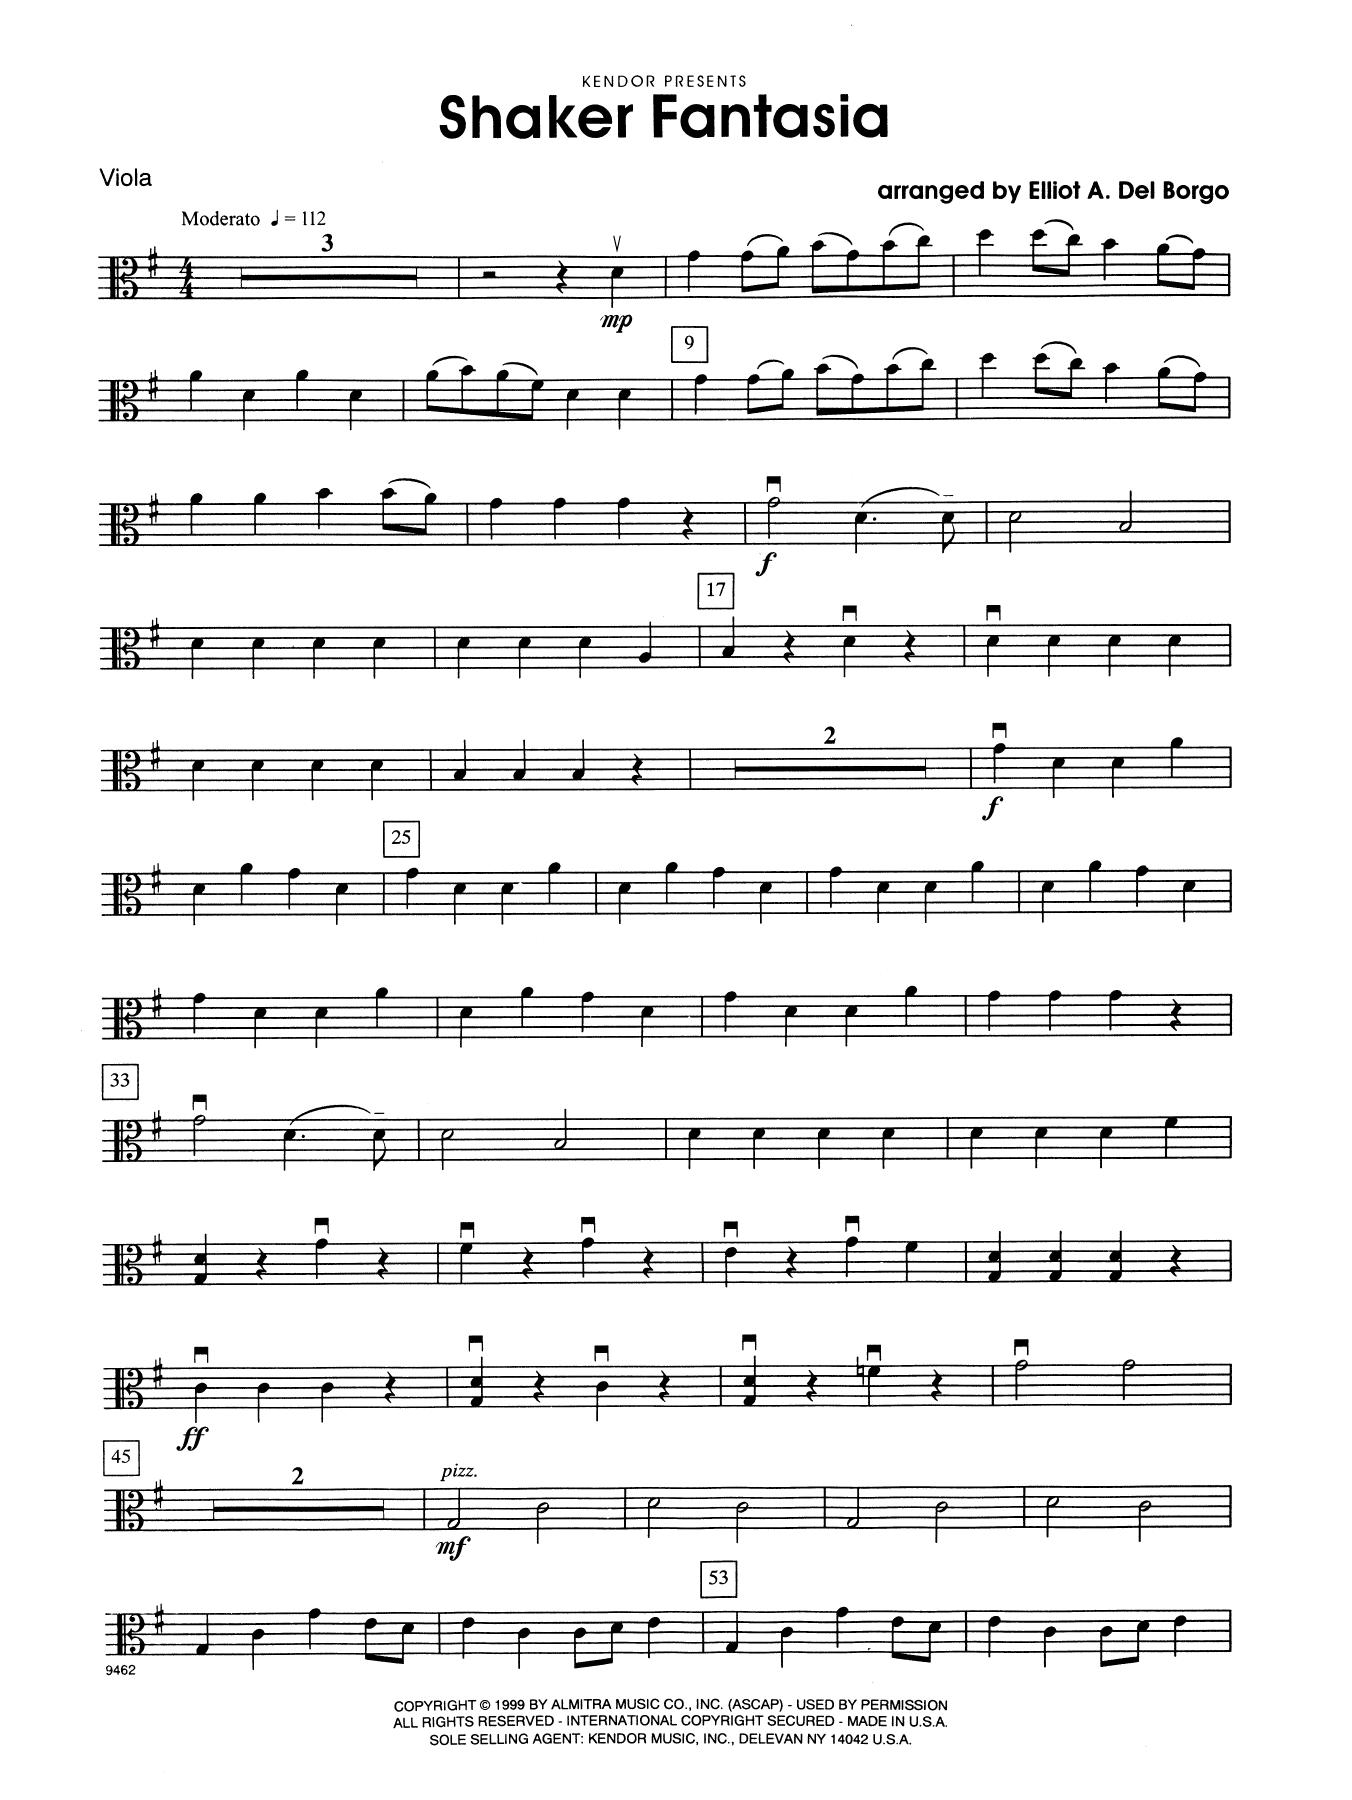 Elliot A. Del Borgo Shaker Fantasia - Viola sheet music notes and chords. Download Printable PDF.